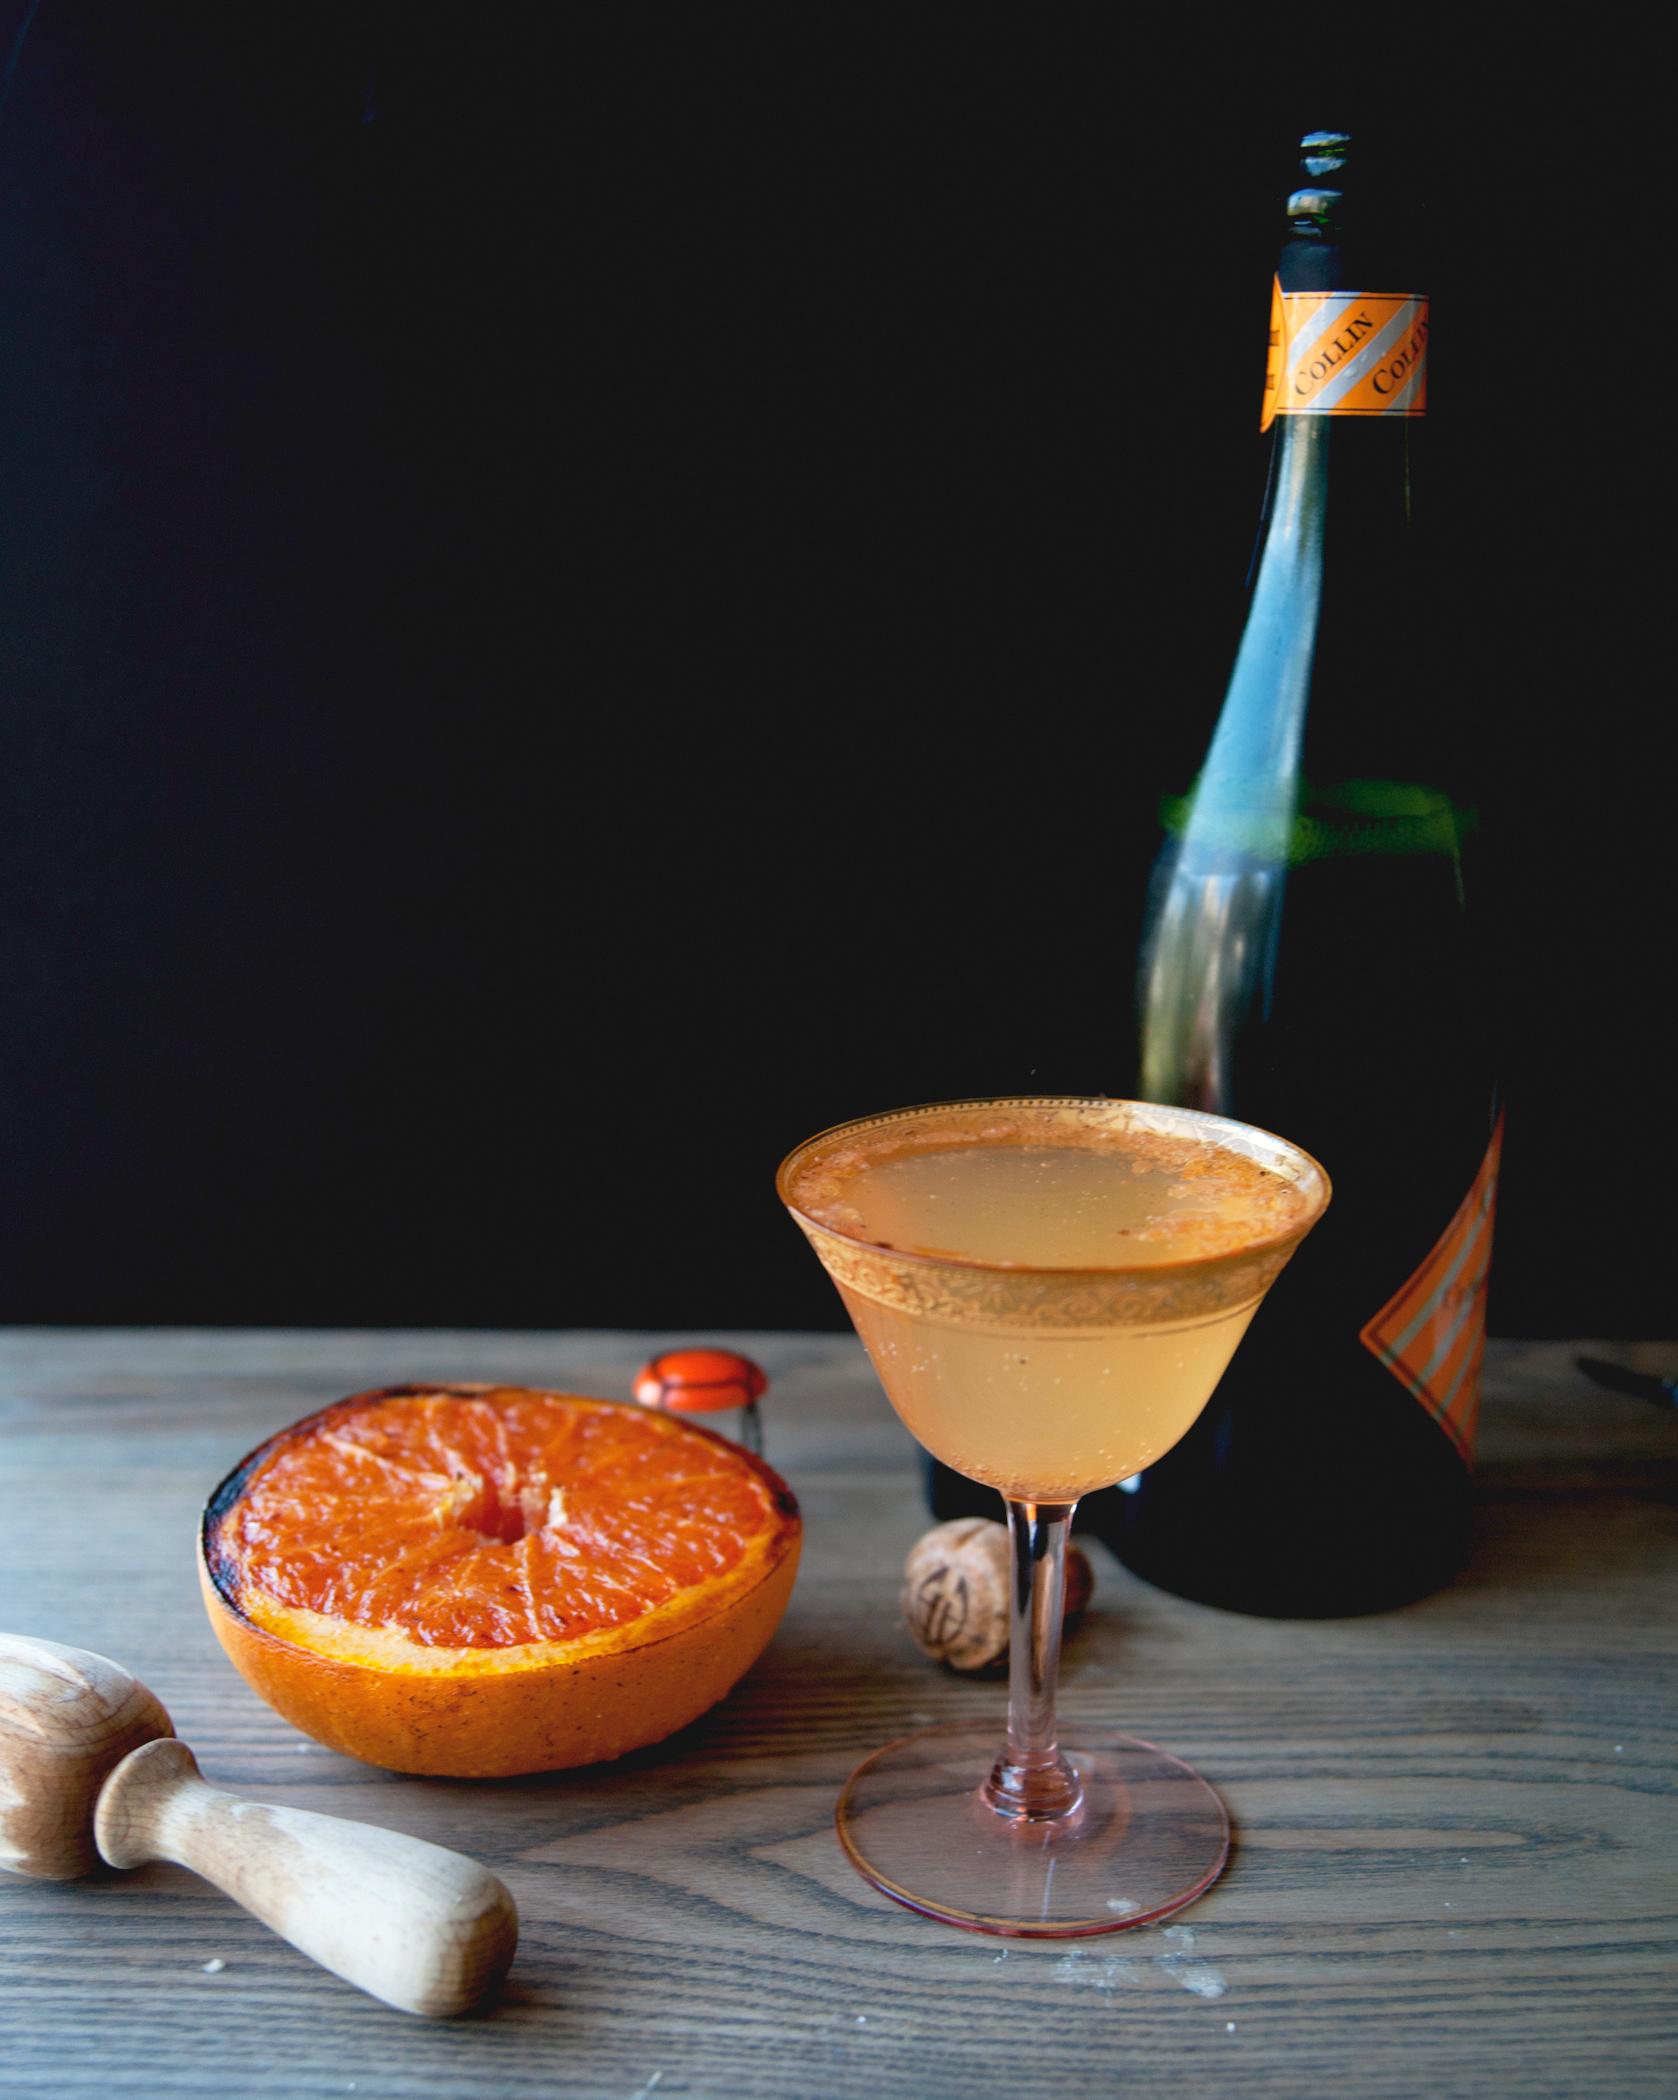 claire-thomas-bridal-shower-garden-food-grapefruit-mimosa-0814.jpg